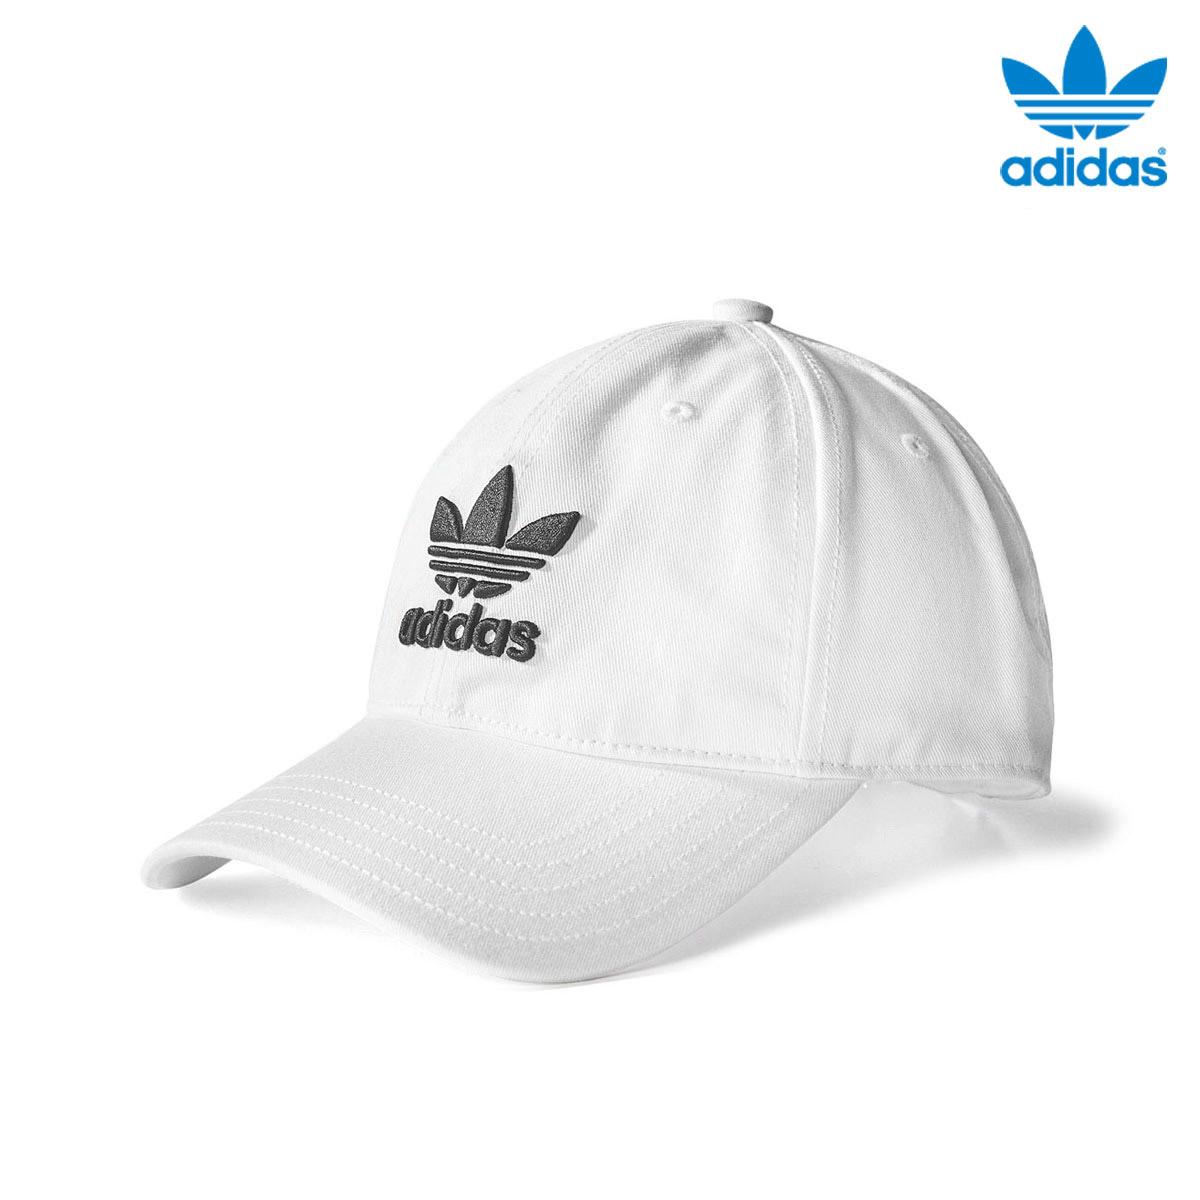 9f15c9ac2b7 adidas Originals TREFOIL CAP (アディダスオリジナルストレフォイルキャップ) White Black 18SS-I